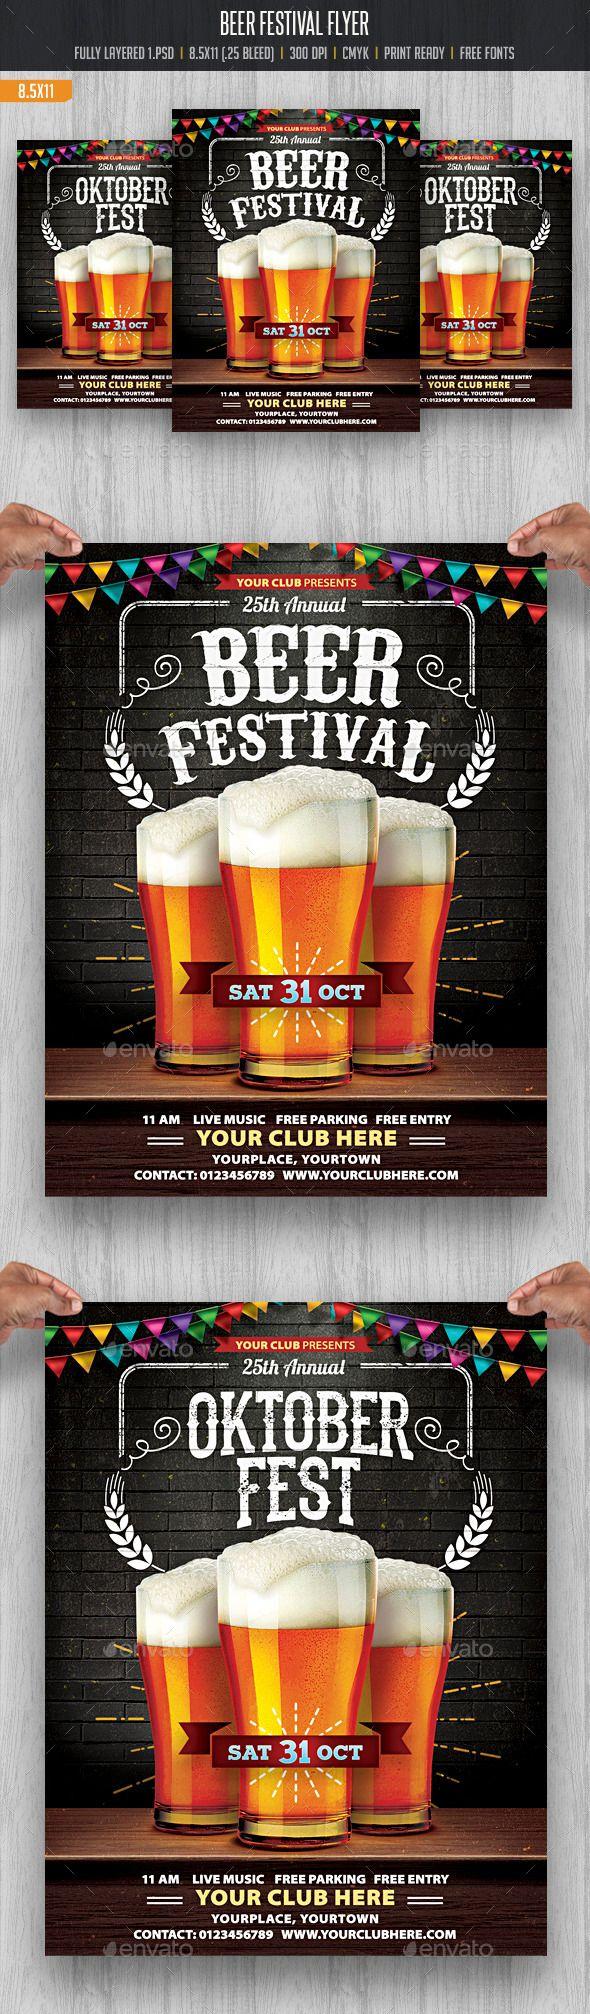 Beer Festival Flyer Template #design Download: http://graphicriver.net/item/beer-festival/12683108?ref=ksioks